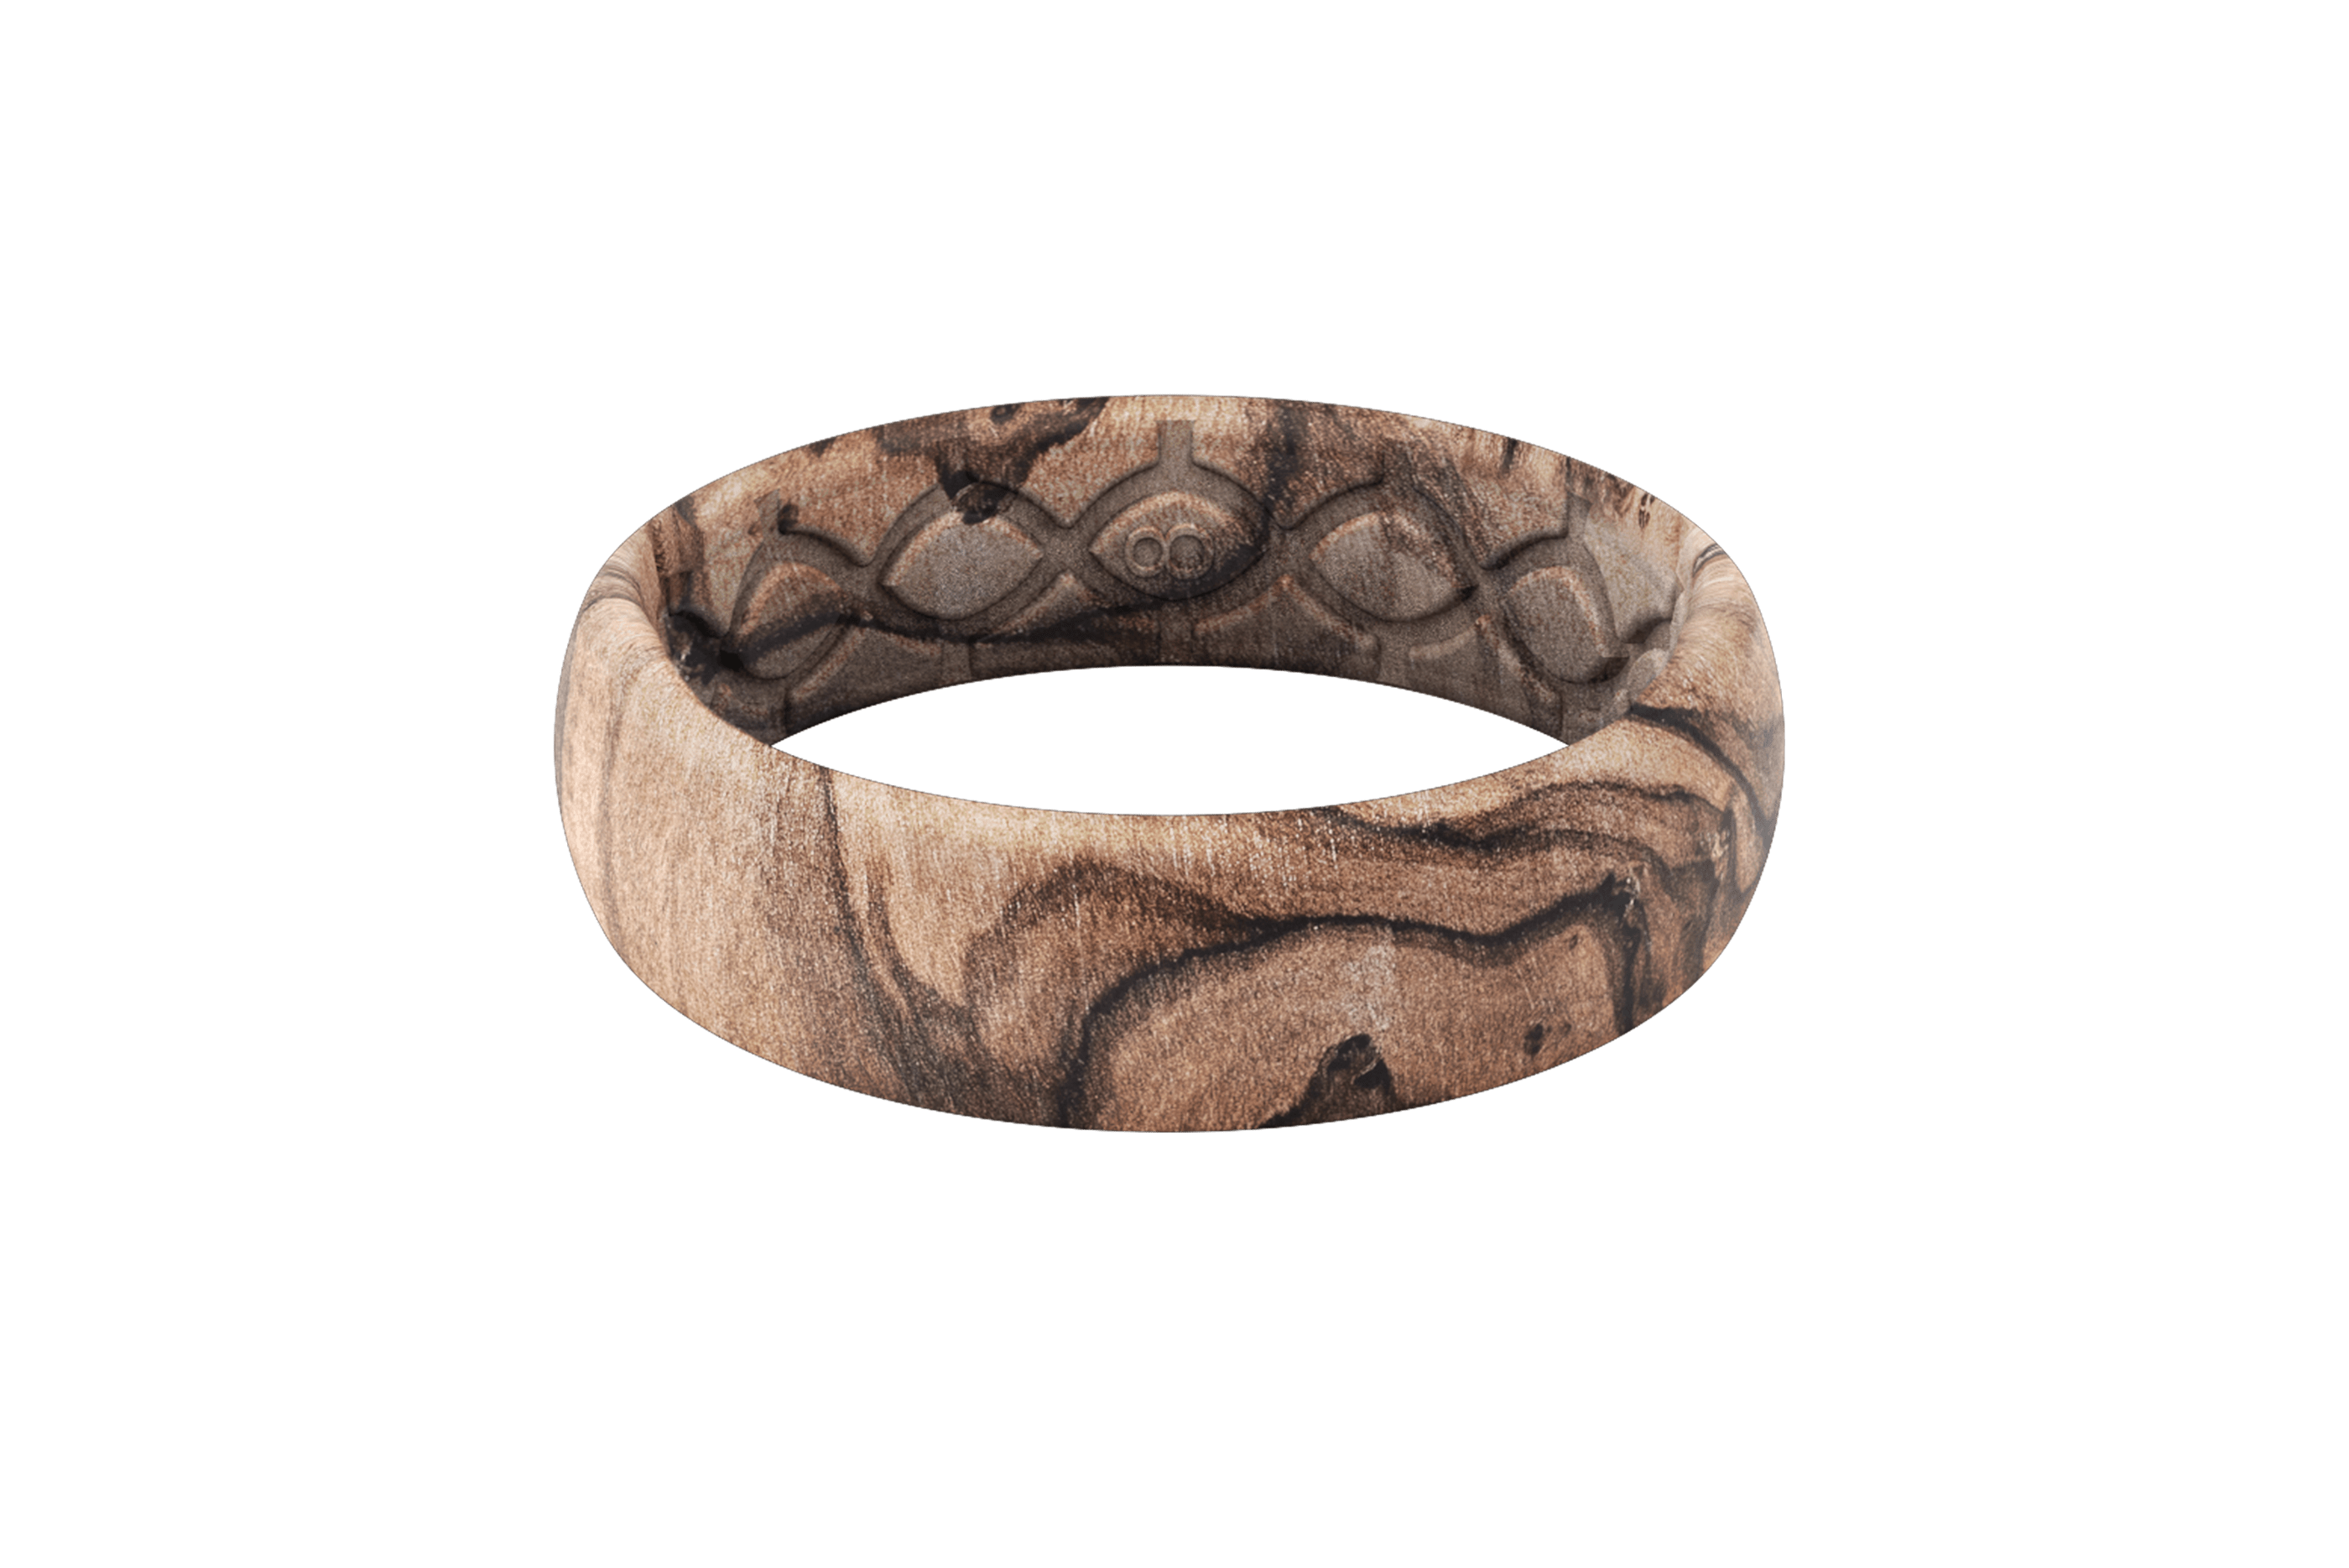 Burled Walnut - Thin - Groove Life Silicone Wedding Rings